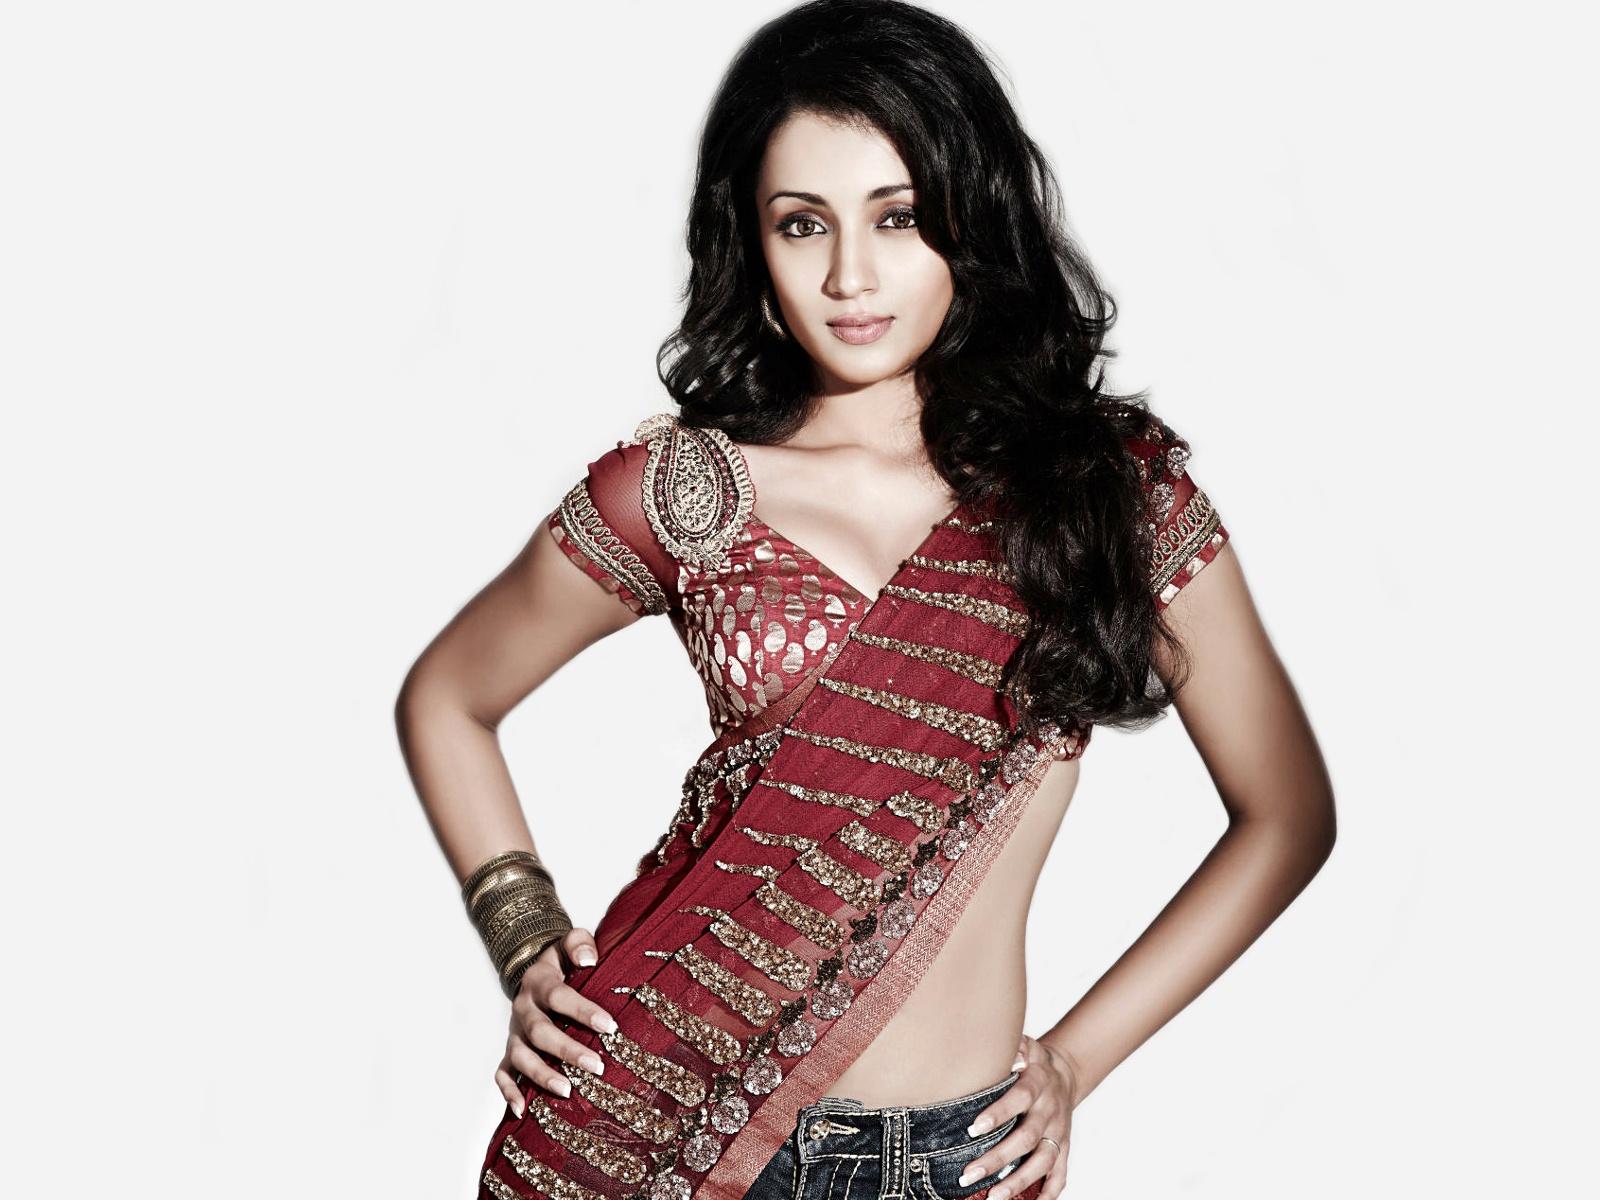 Indian Girl Wallpaper Full Hd Download Trisha Maxim Wallpapers Hd Wallpapers Id 9224